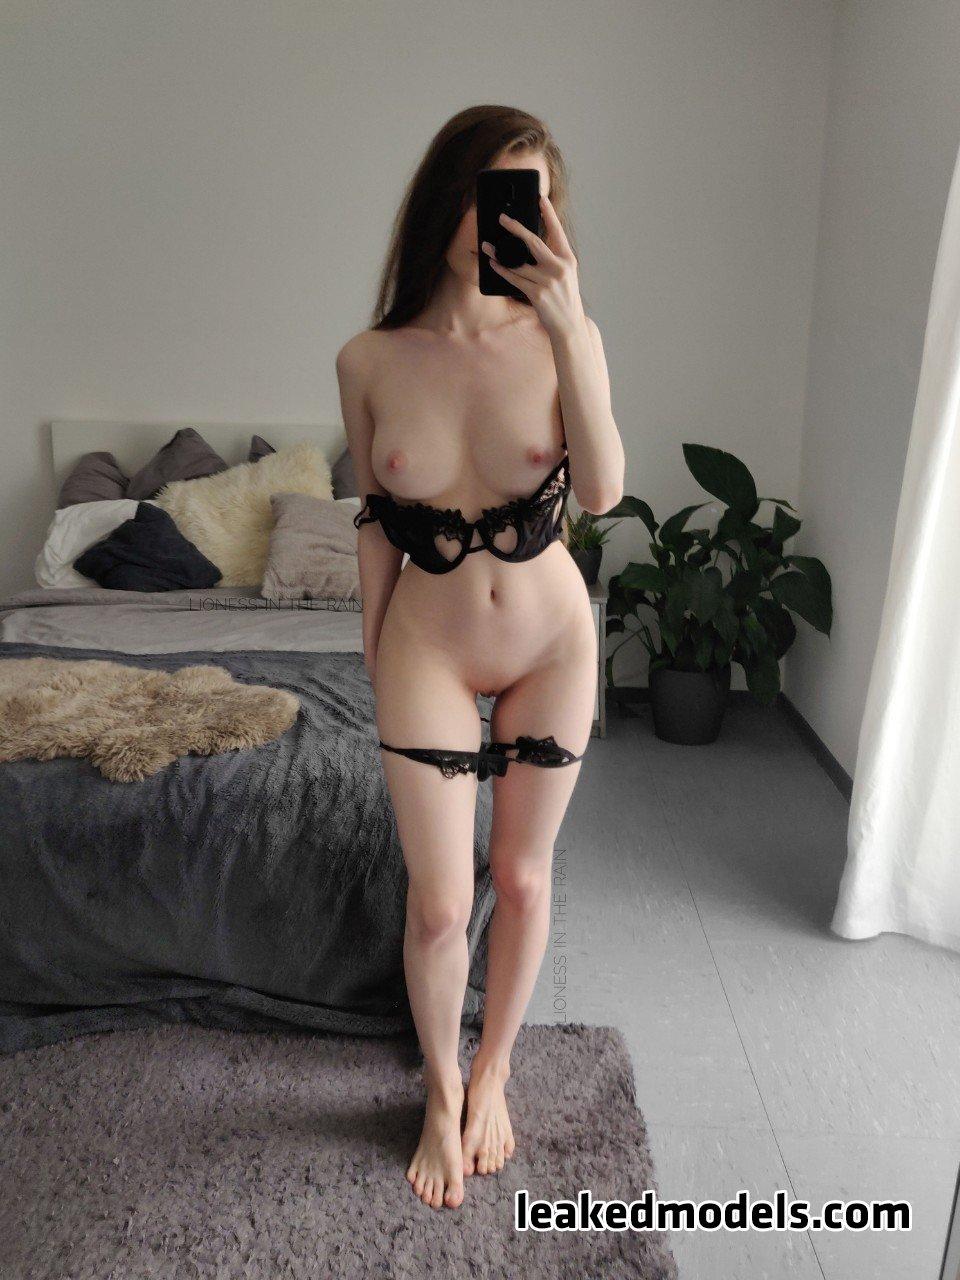 Rachel Lioness in the rain – Lionessintherain Instagram Nude Leaks (25 Photos)